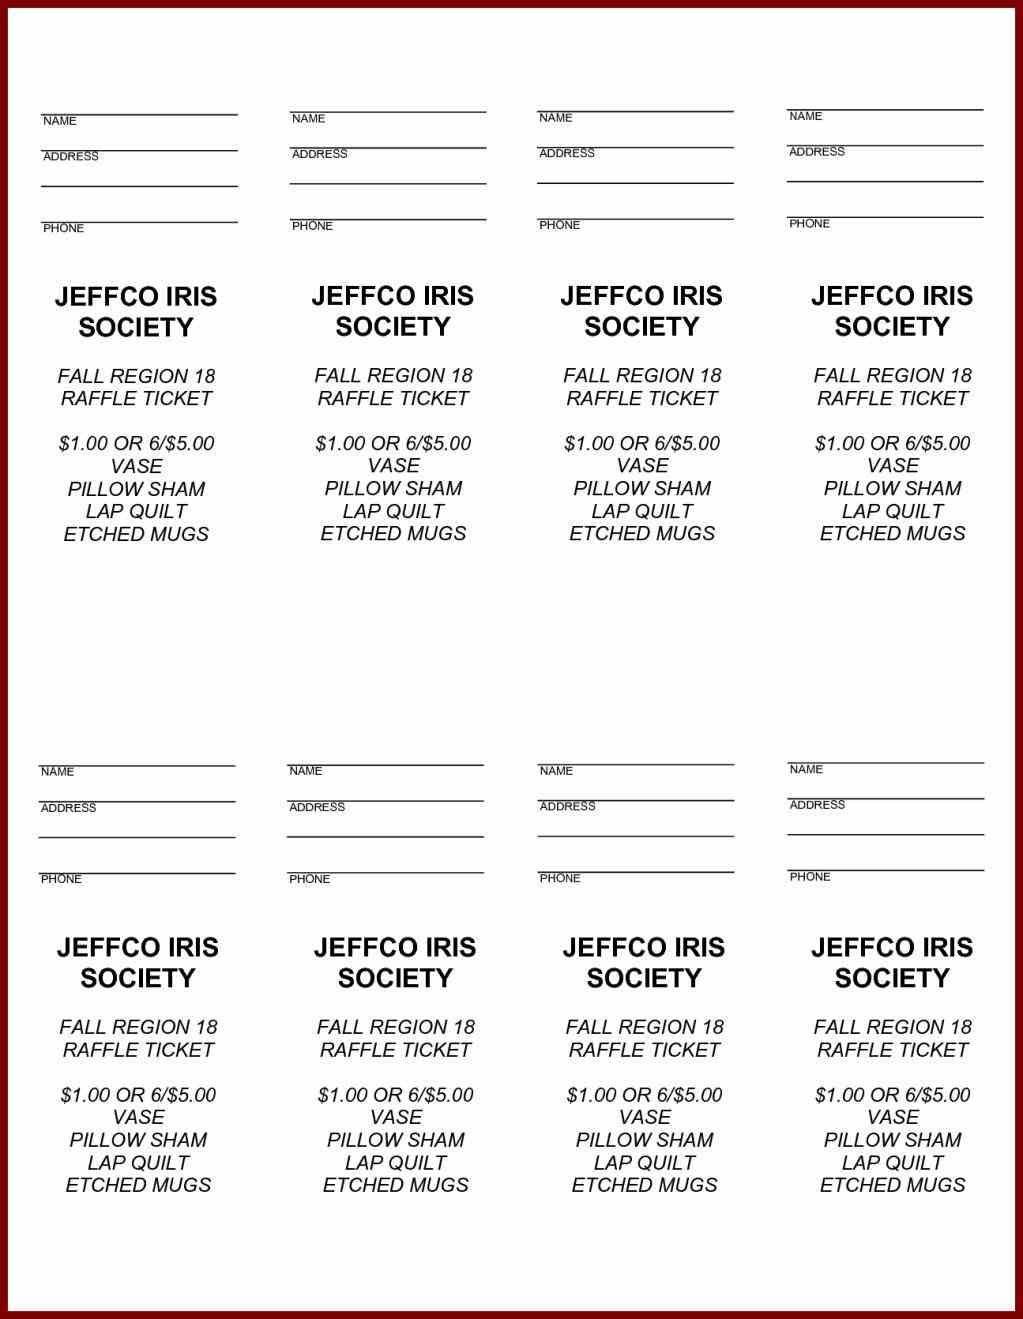 Free Printable Raffle Ticket Template Easytouse Free Raffle Ticket - Free Printable Raffle Tickets